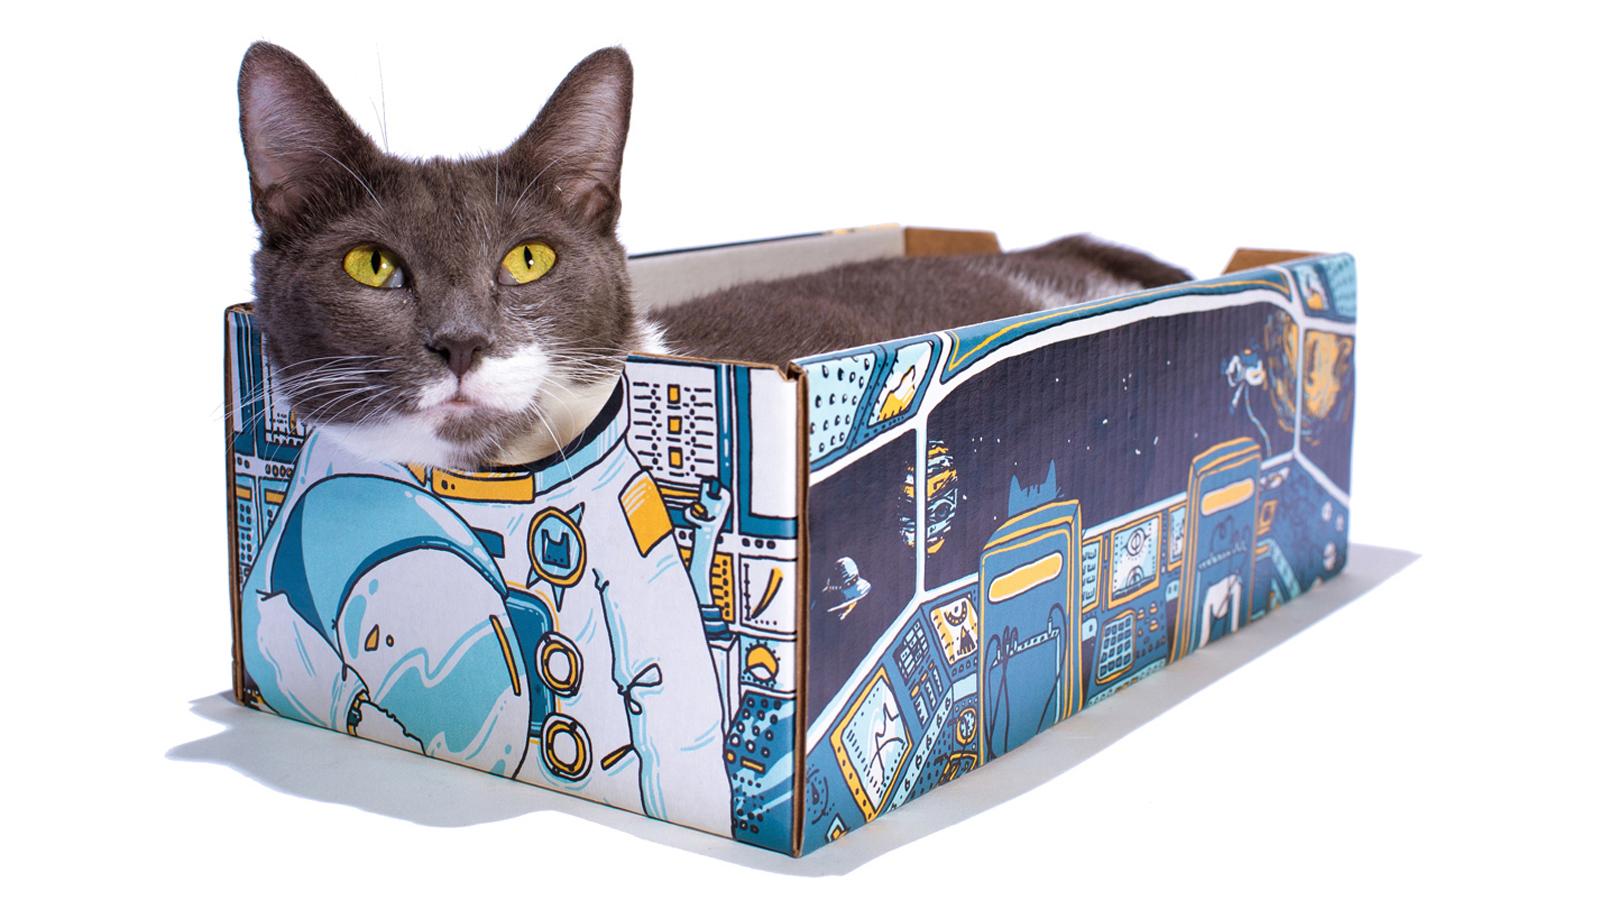 Catbox_ASTRObox_press release img 02.jpg